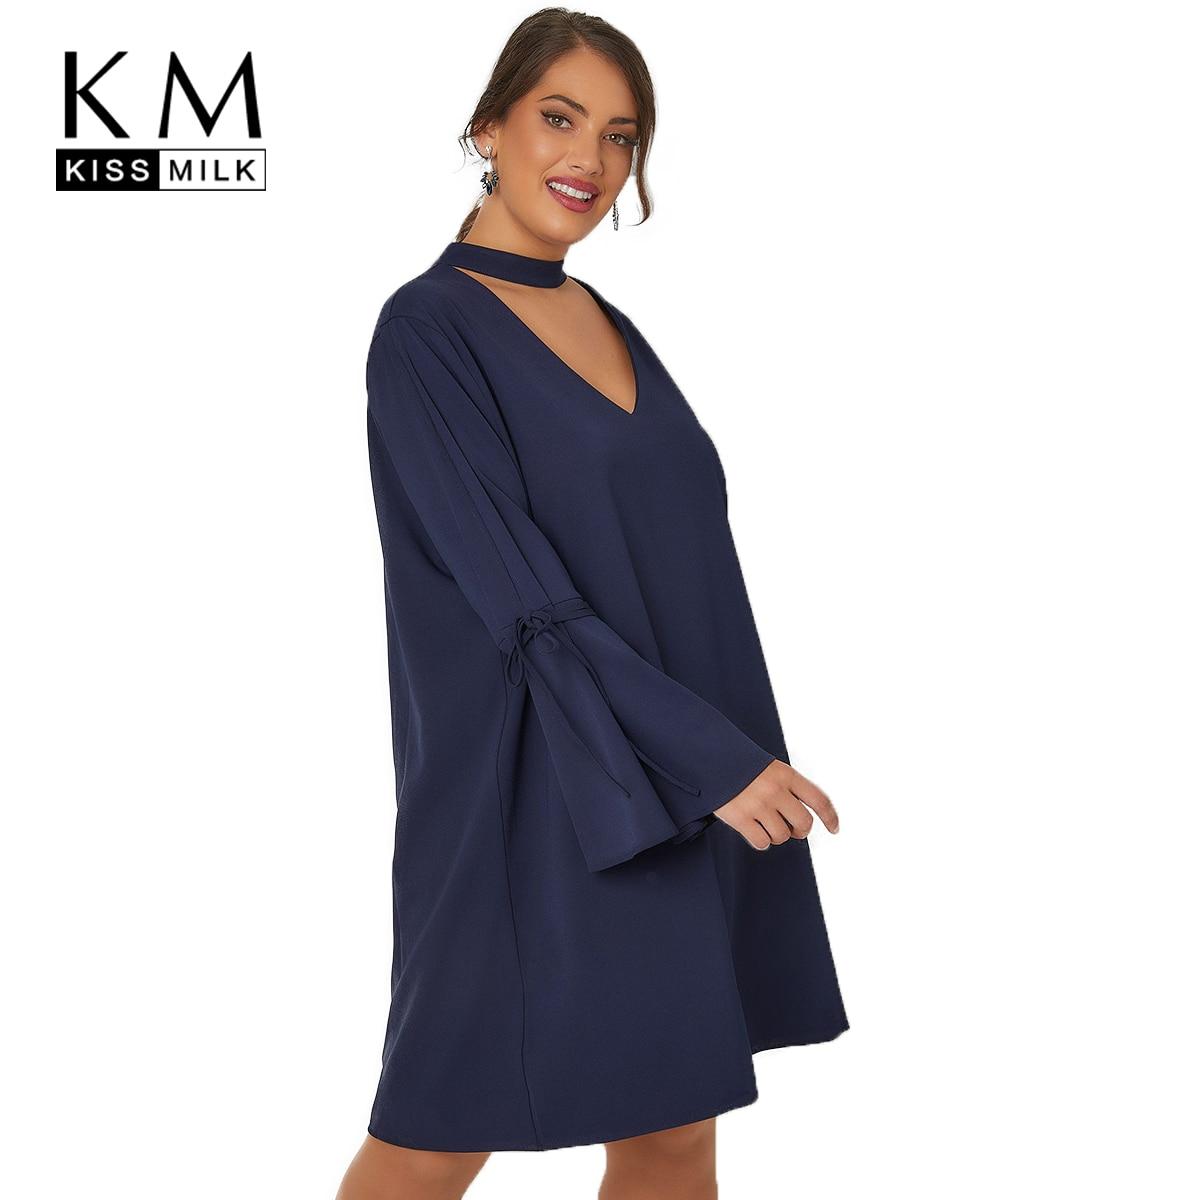 777b618c2cc9 Kissmilk 2018 Plus Size Hollow Out Women Dress Large Size Lace Up Flare  Sleeve Female Clothing